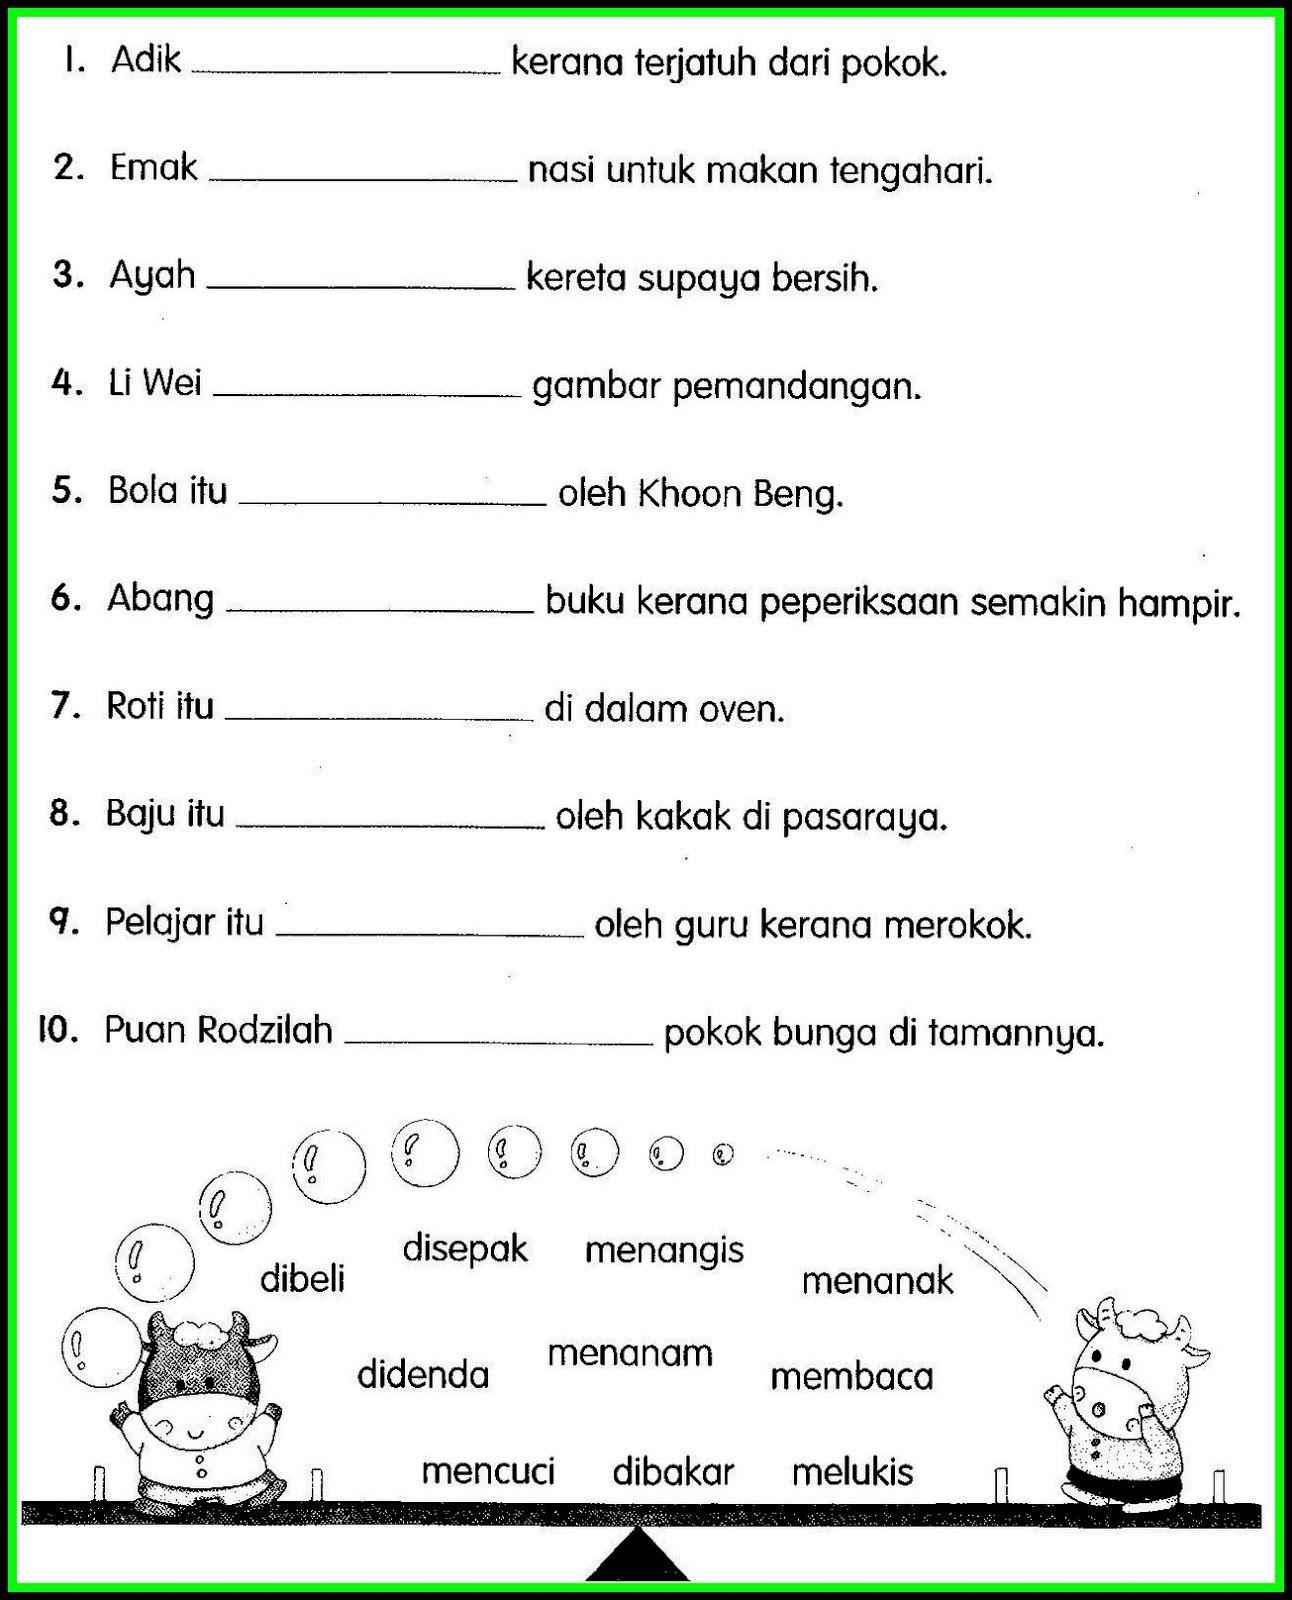 Image Result For Soalan Penulisan Bahasa Melayu Tahun 1 Malay Language Elementary Learning Preschool Writing